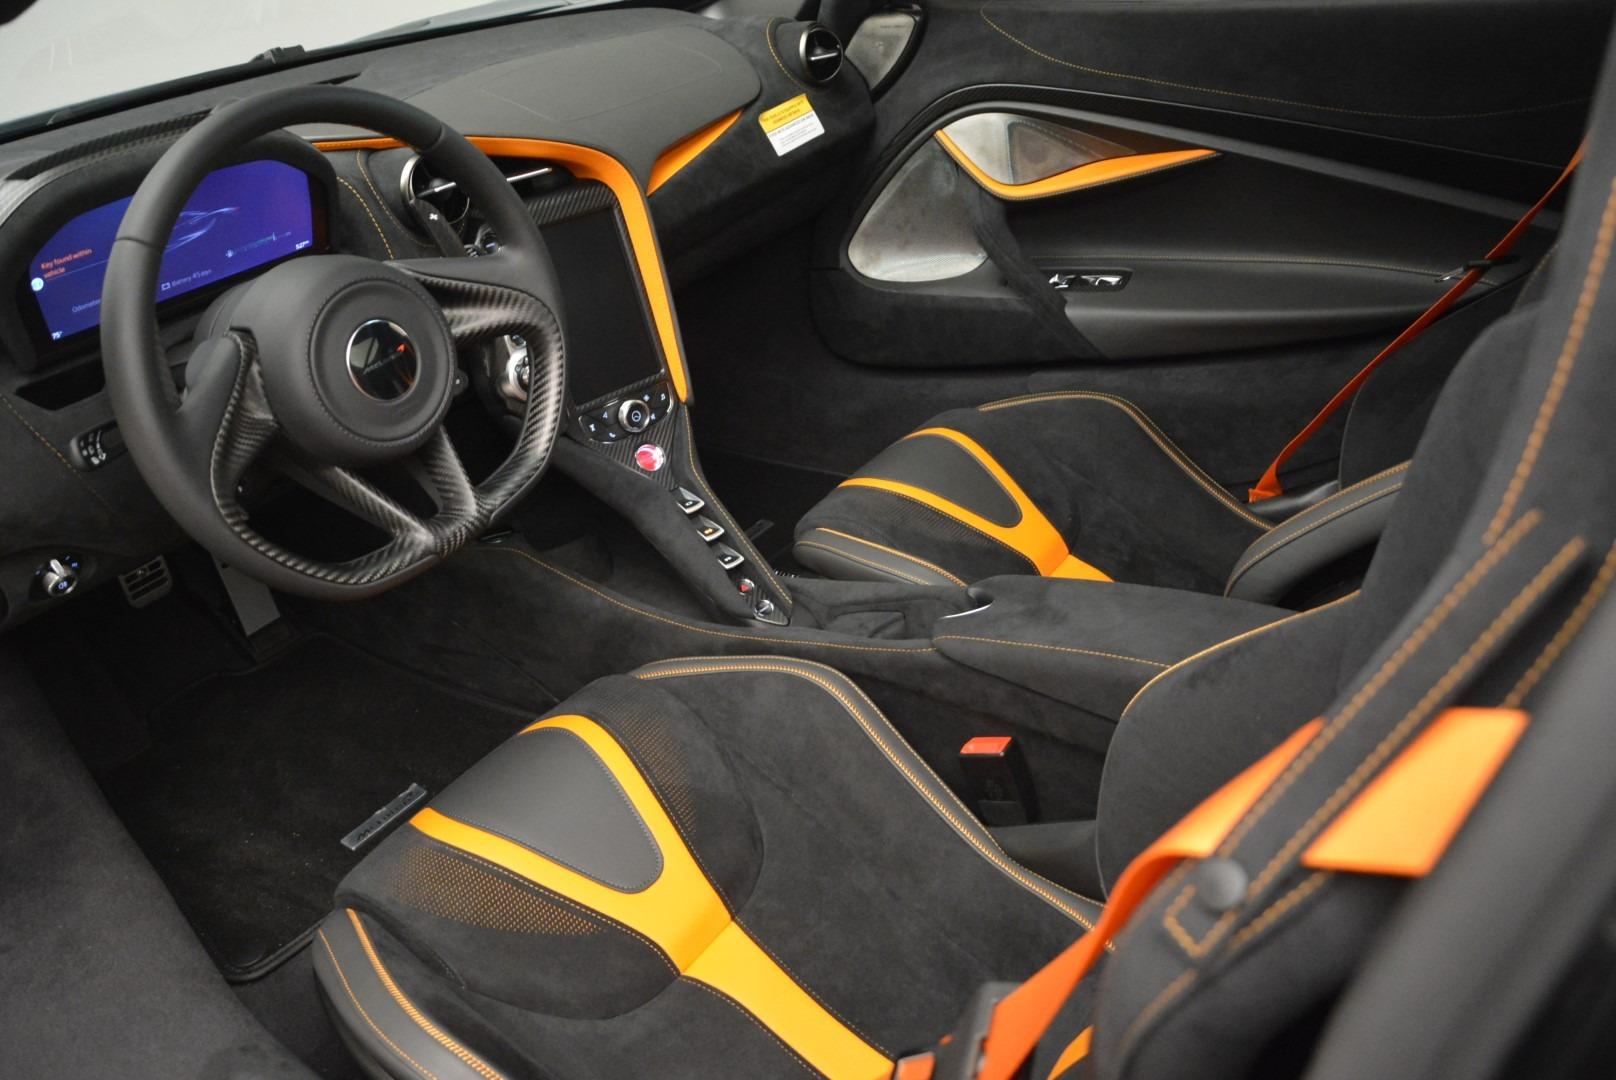 Used 2018 McLaren 720S Coupe For Sale In Westport, CT 3205_p15